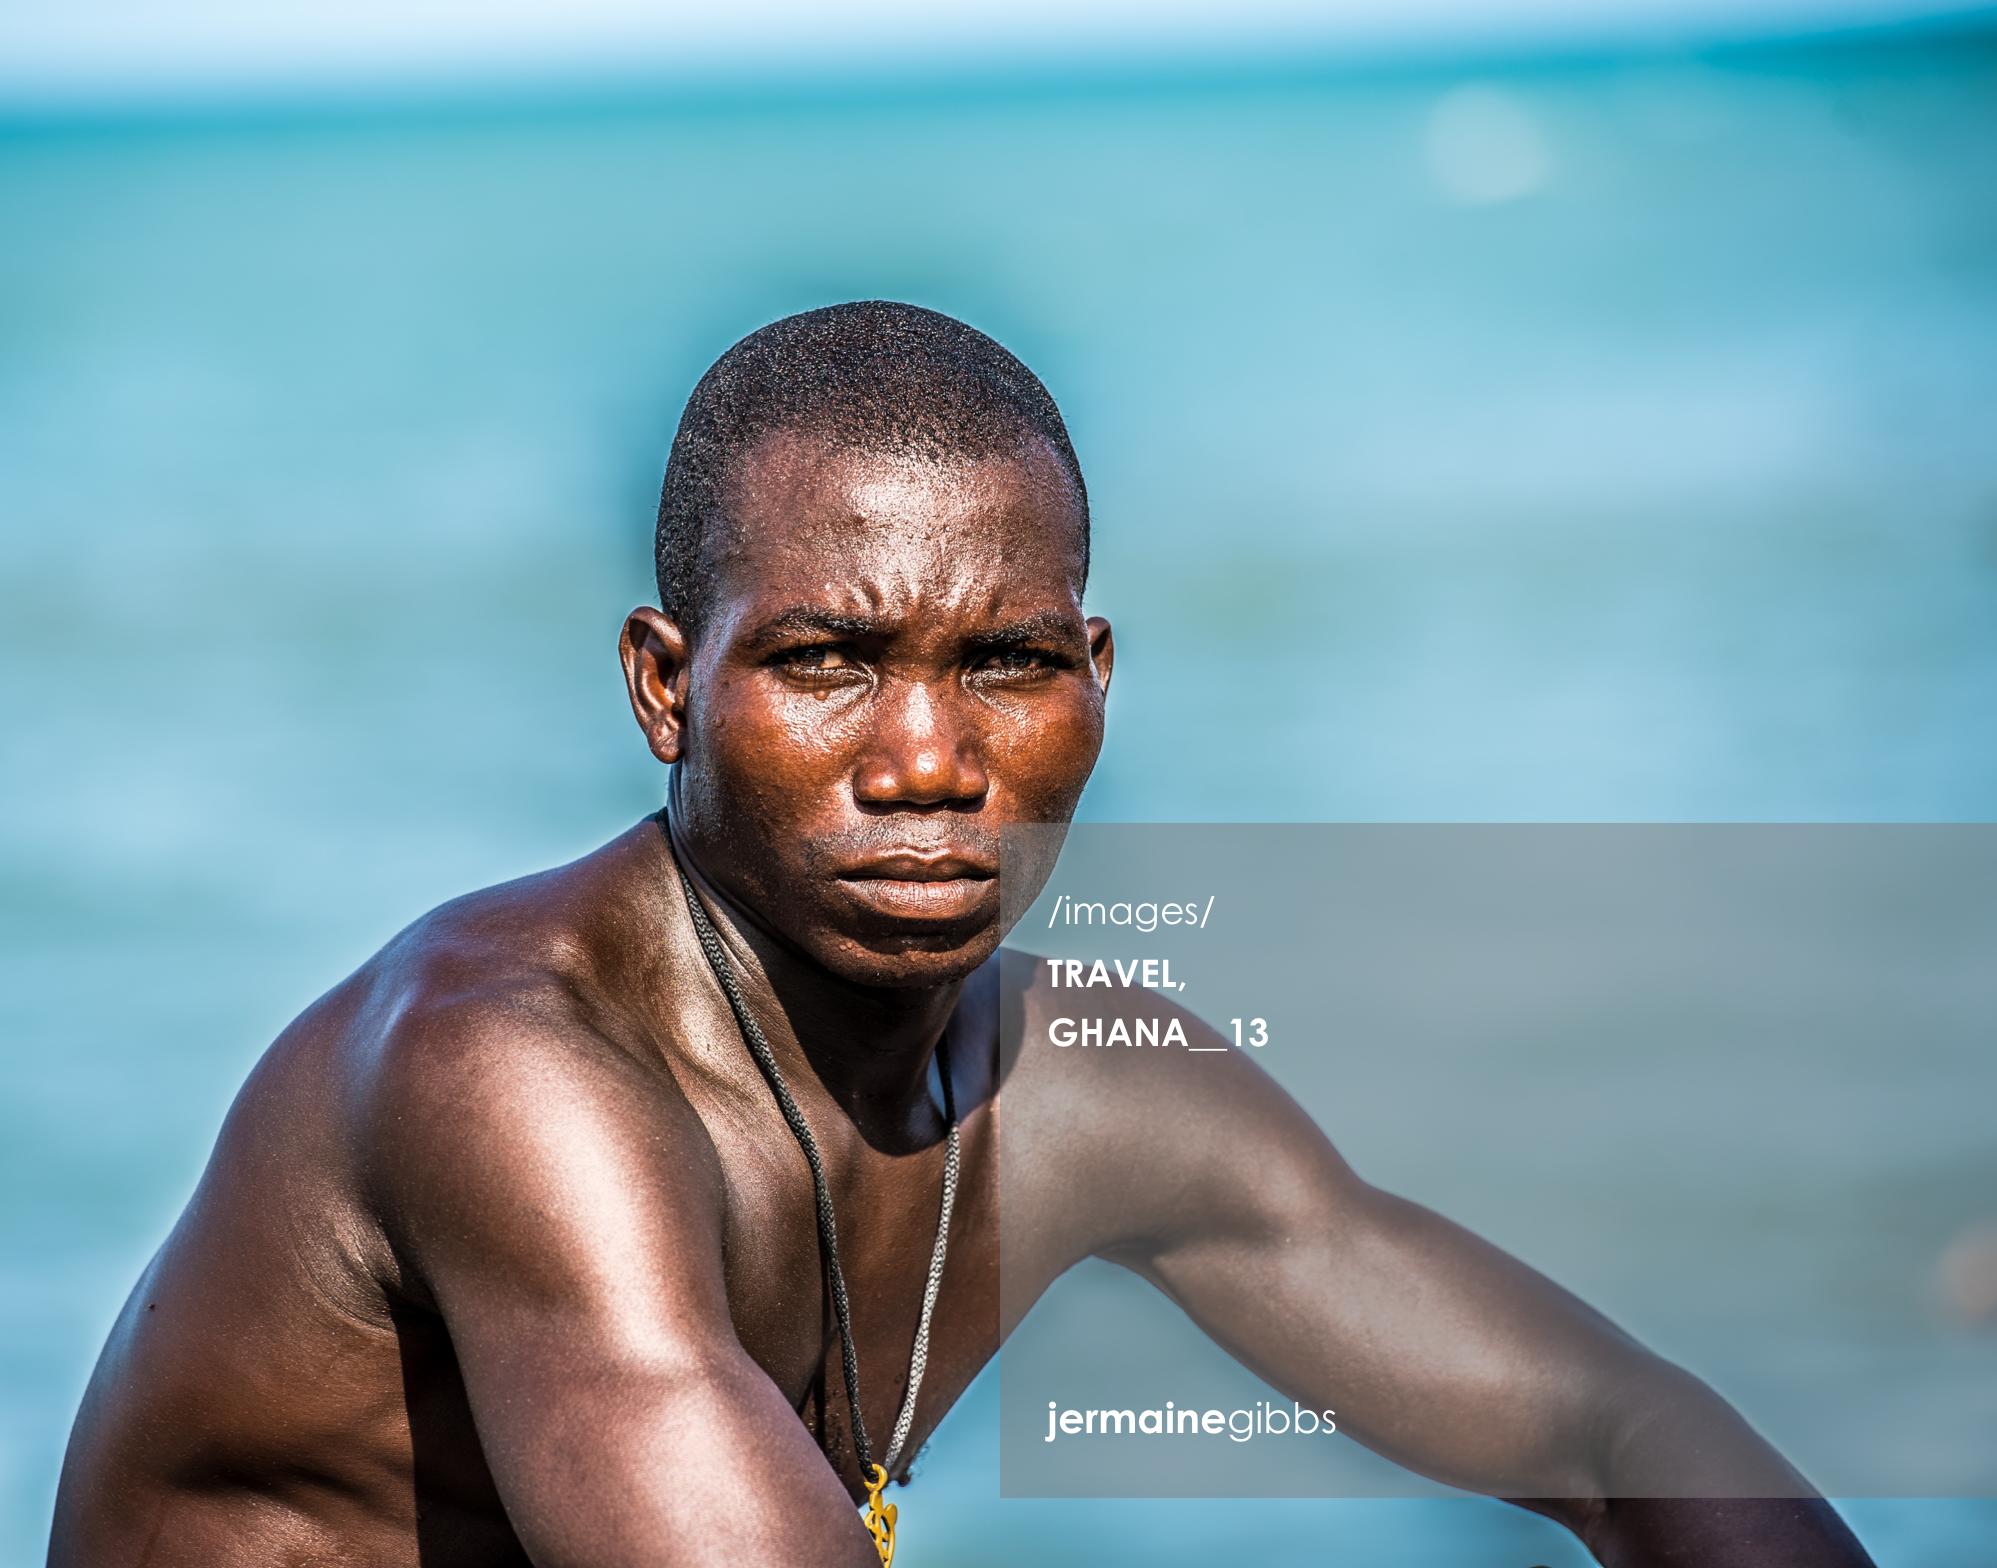 Travel_Ghana__13